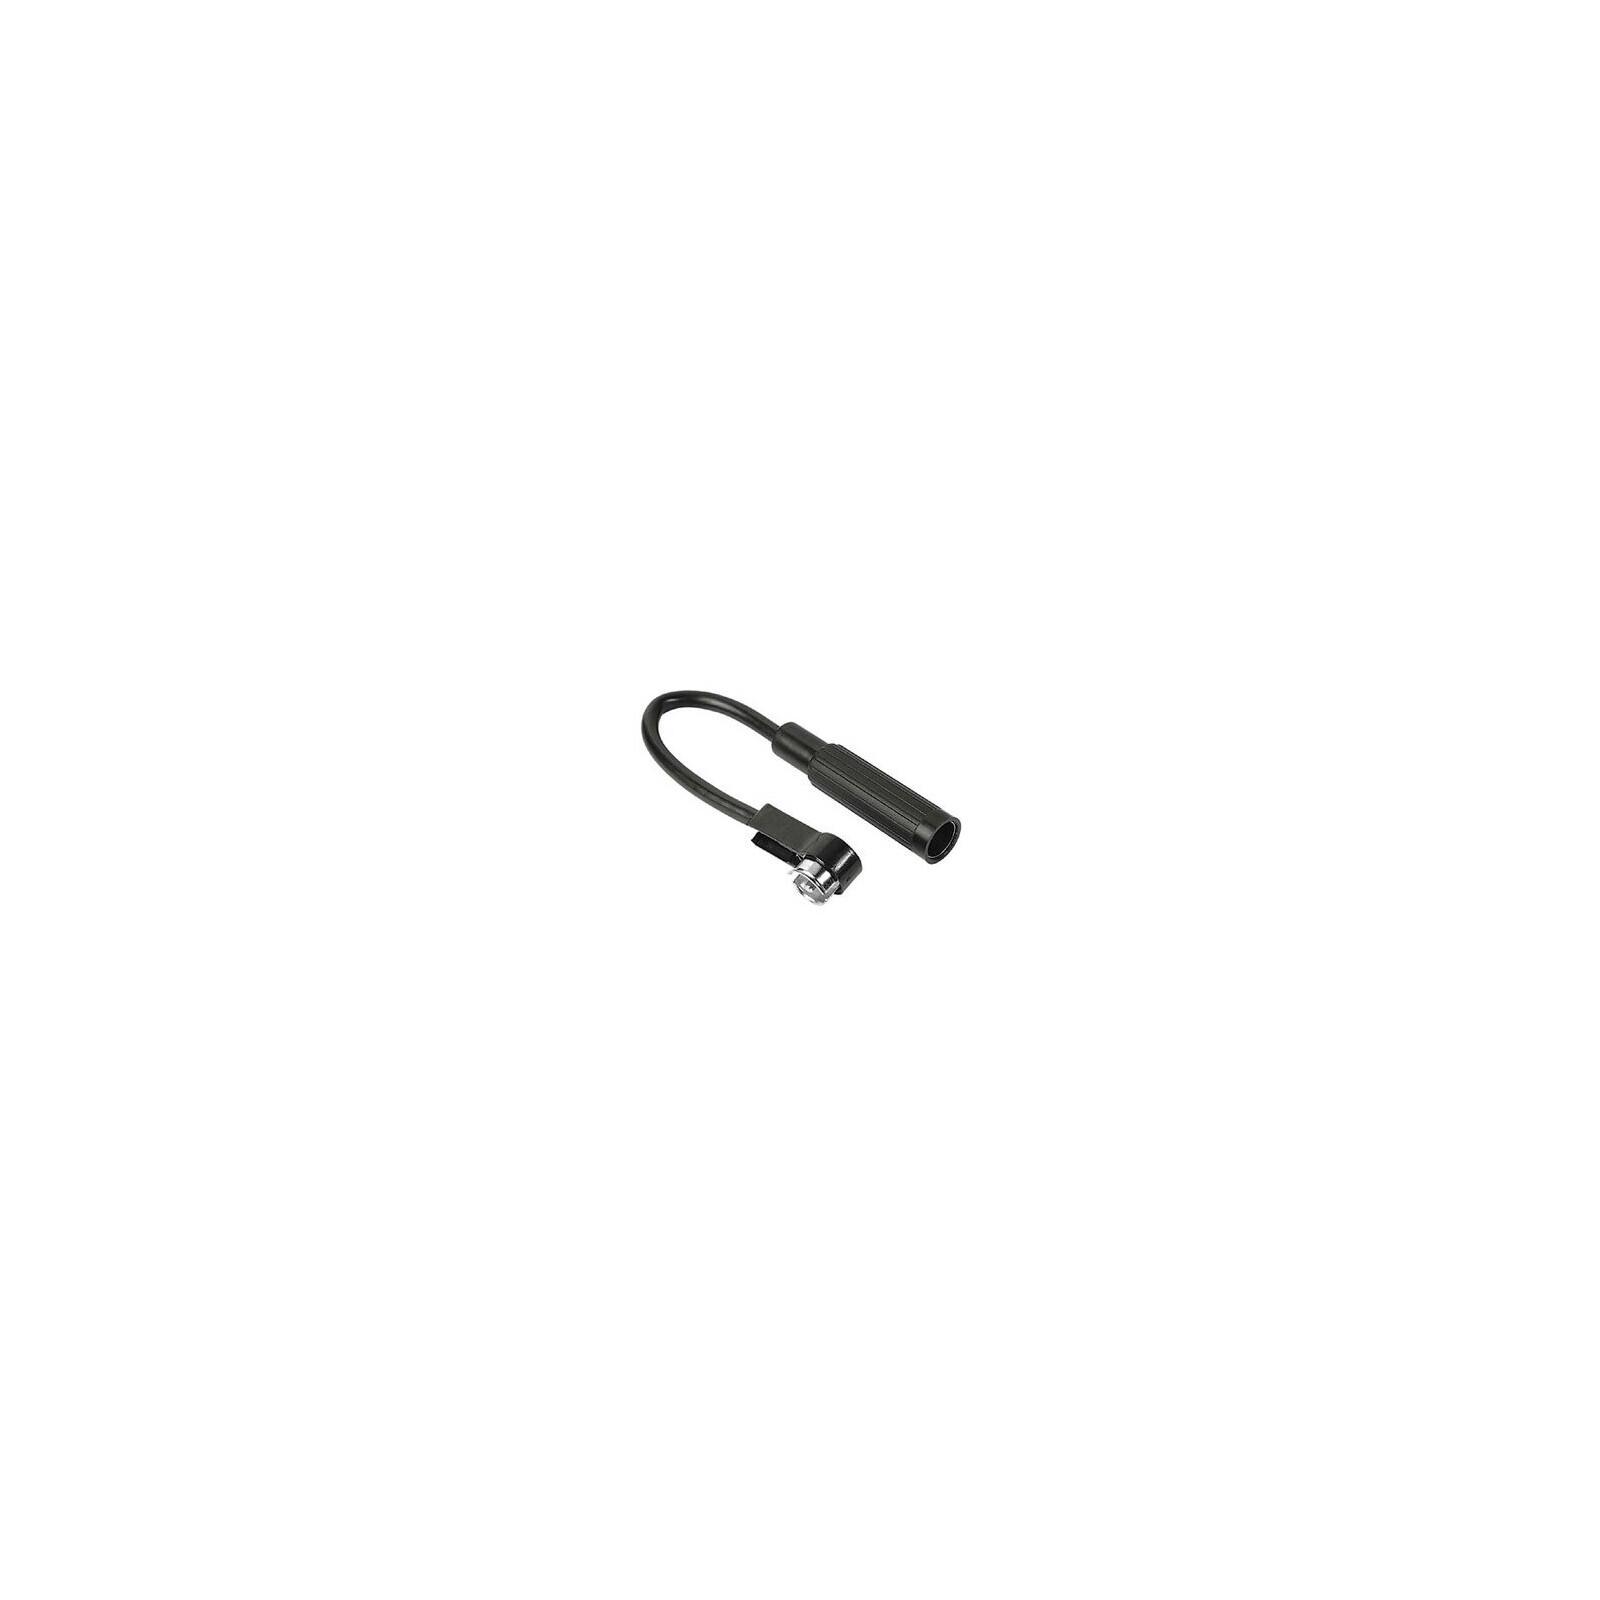 Hama 43643 Antennen-Adapter Stecker ISO, 90° - Kupplung DIN